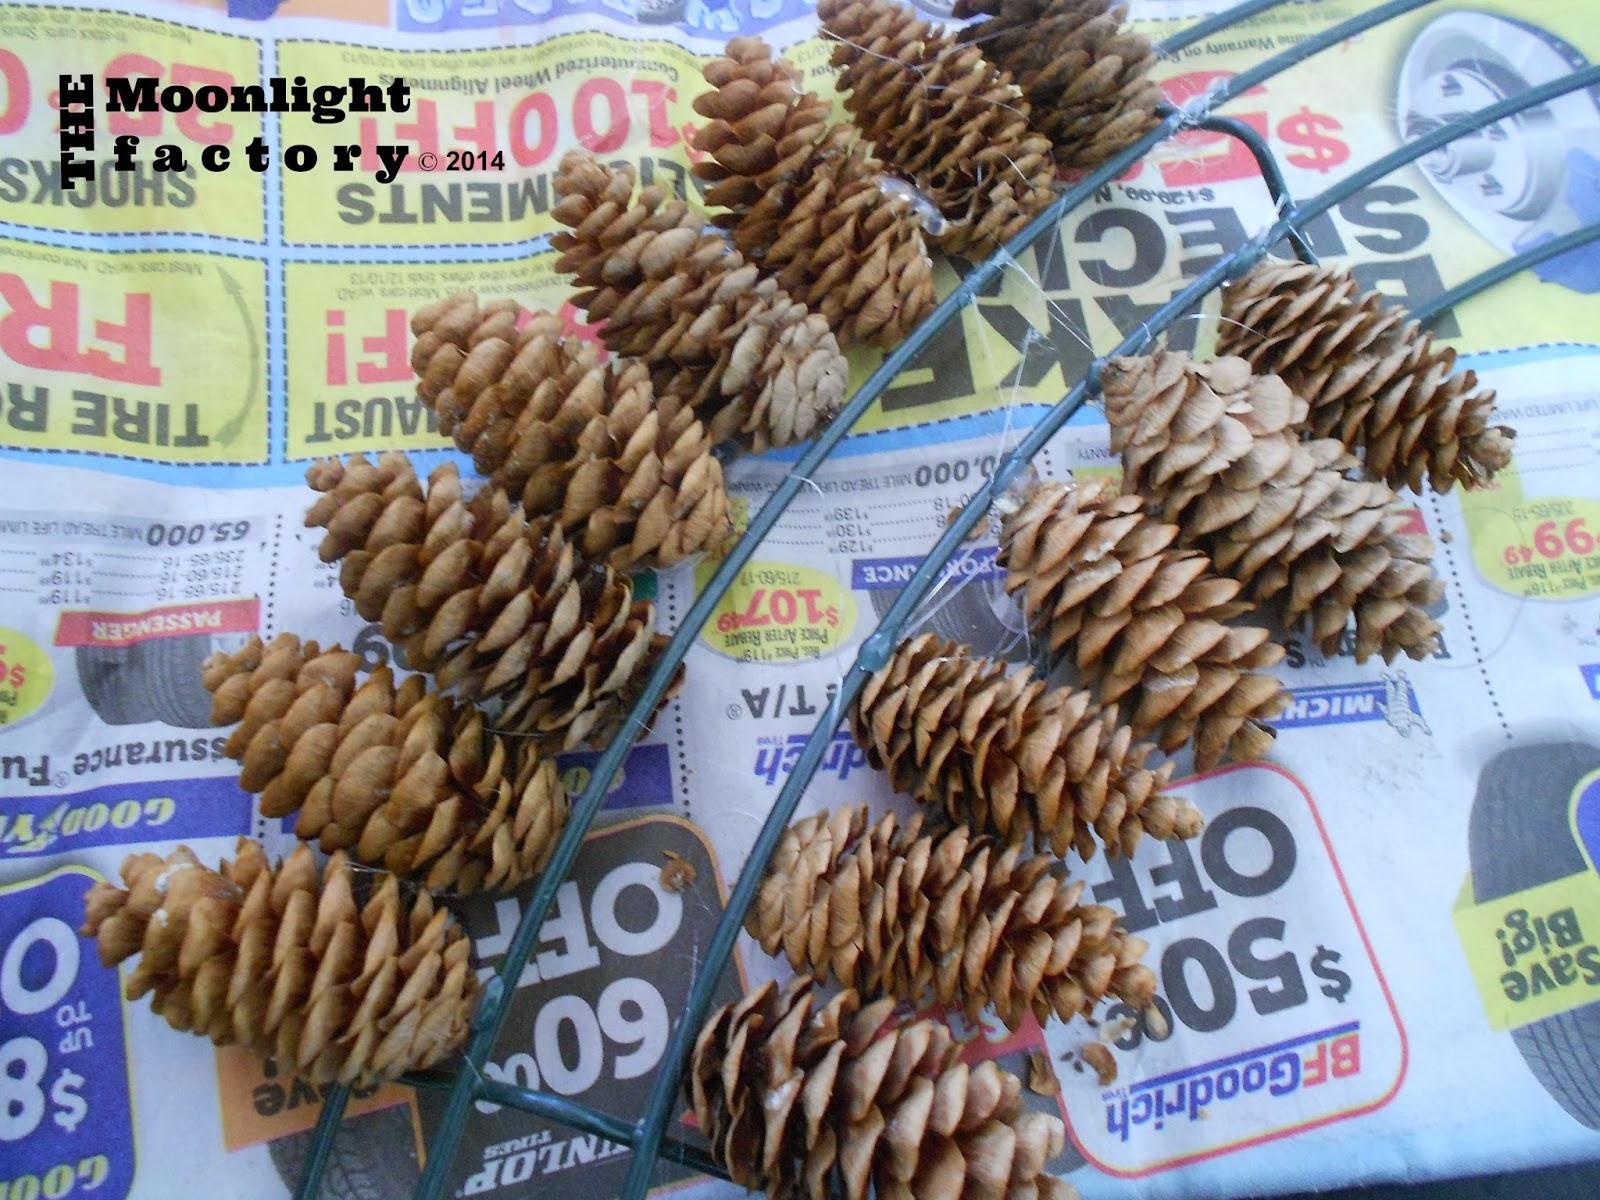 the moonlight factory pine cones galore